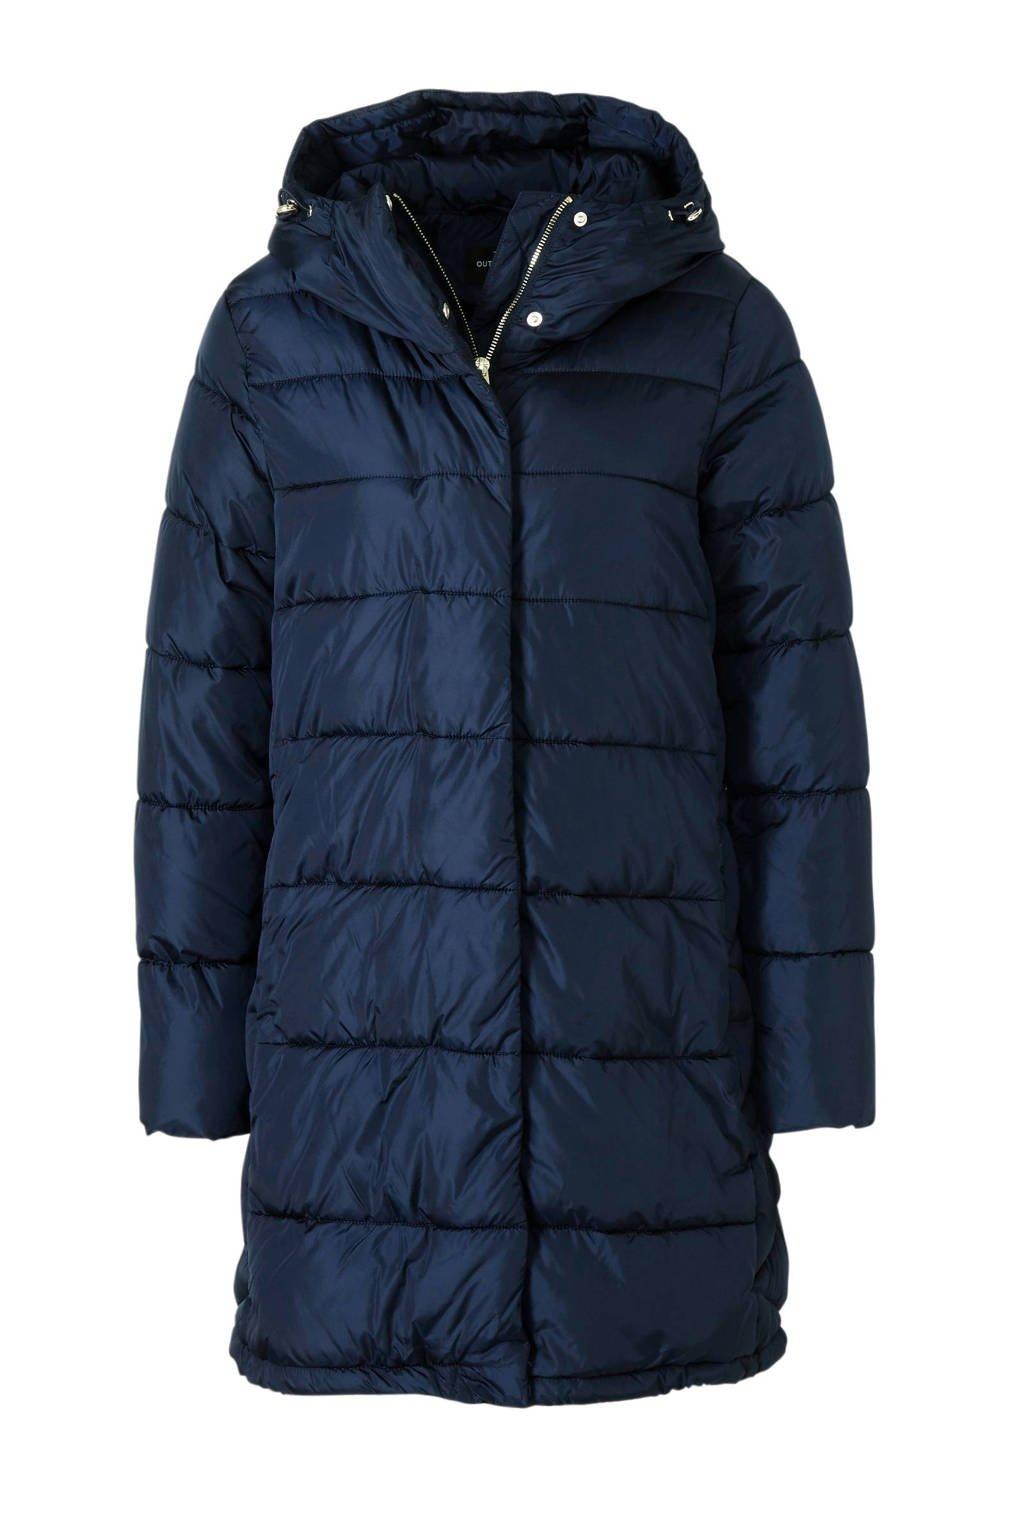 C&A Yessica gewatteerde winterjas donkerblauw, Donkerblauw